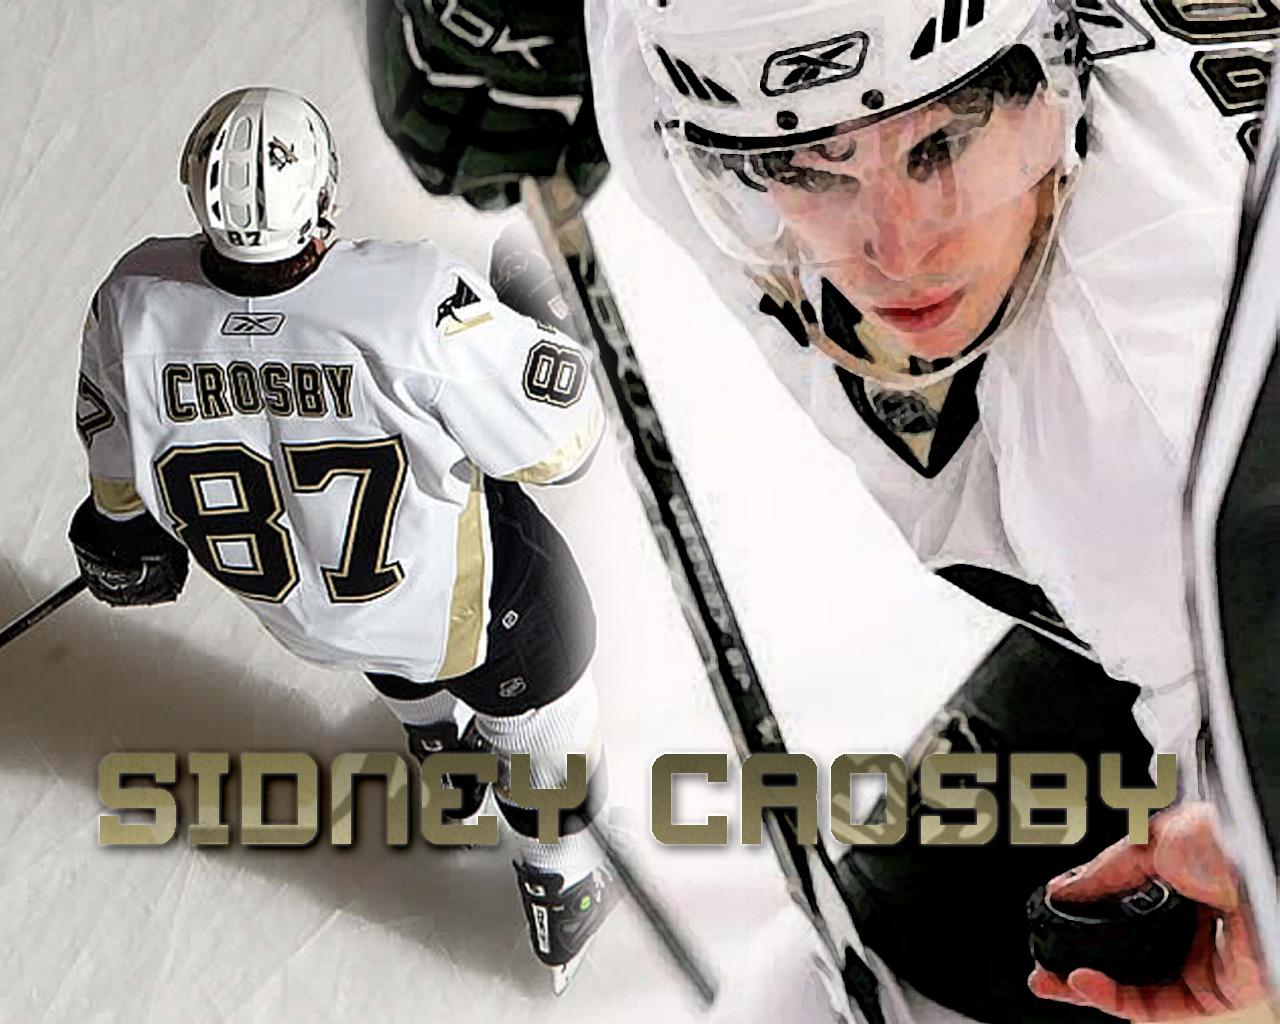 Sidney Crosby Stanley Cup Playoffs Wallpaper 1280x1024